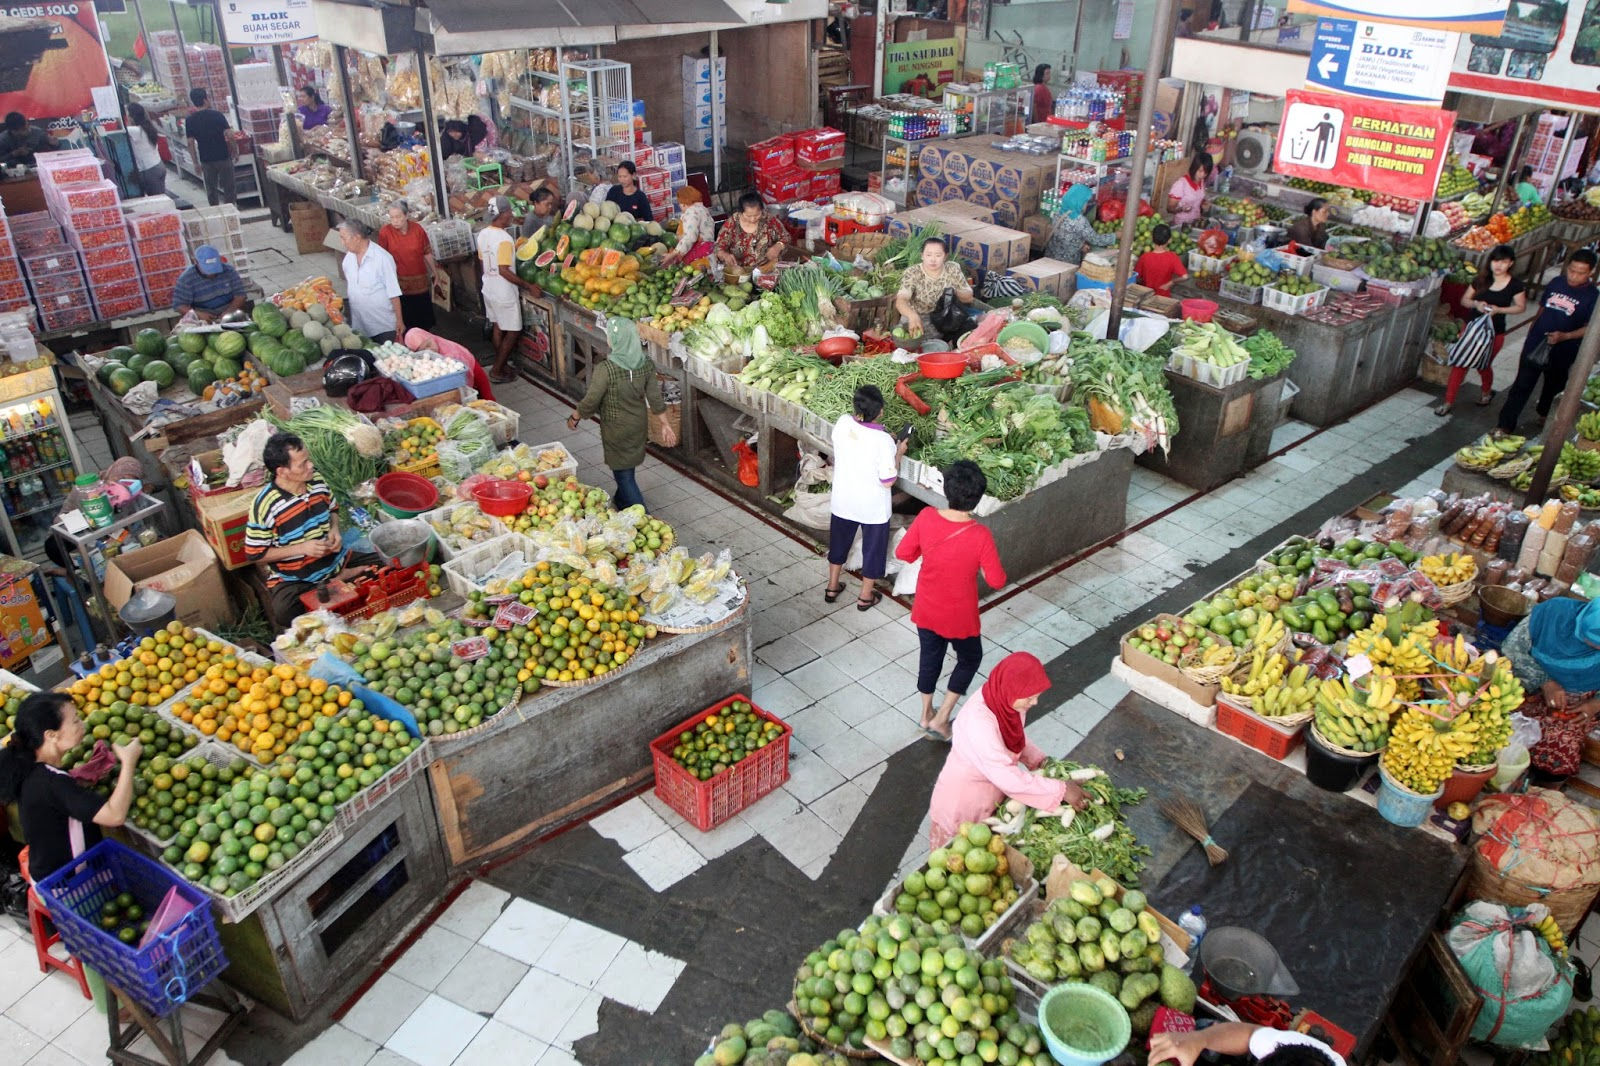 https: img-z.okeinfo.net content 2018 12 08 320 1988601 bagaimana-harga-pangan-jelang-natal-dan-tahun-baru-RoMUZDOaDy.jpg